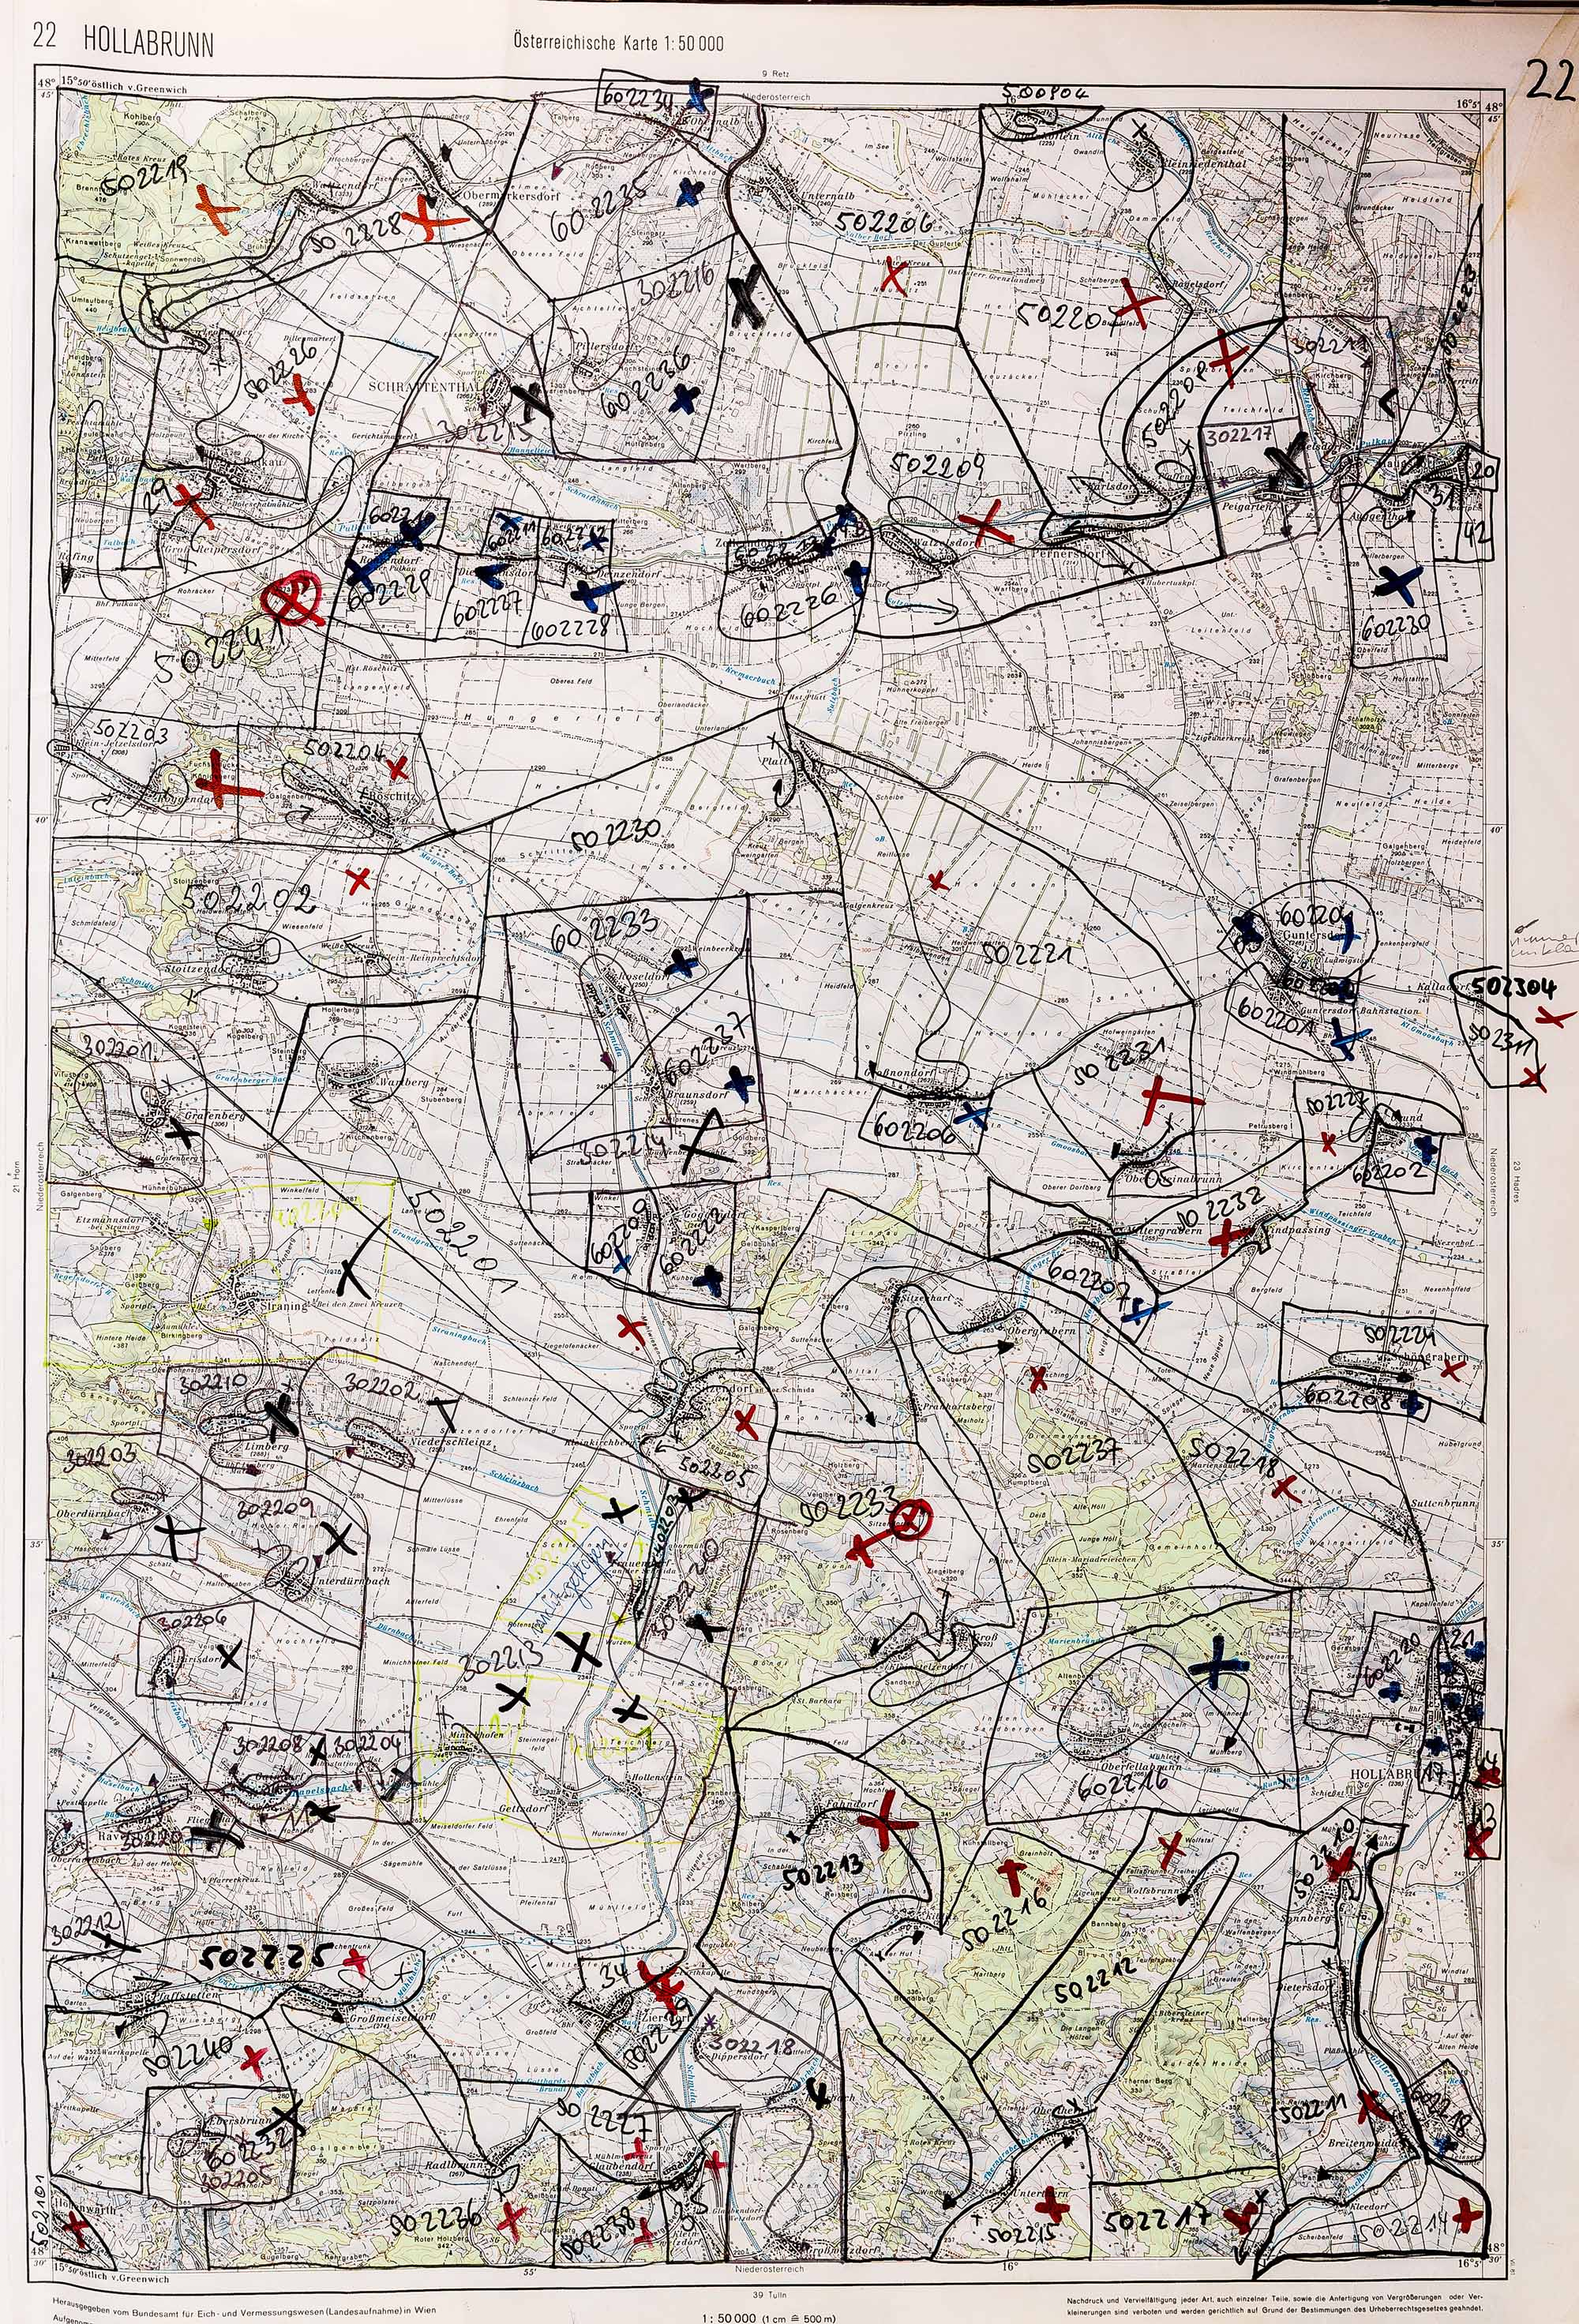 1983-1986 Karte 022